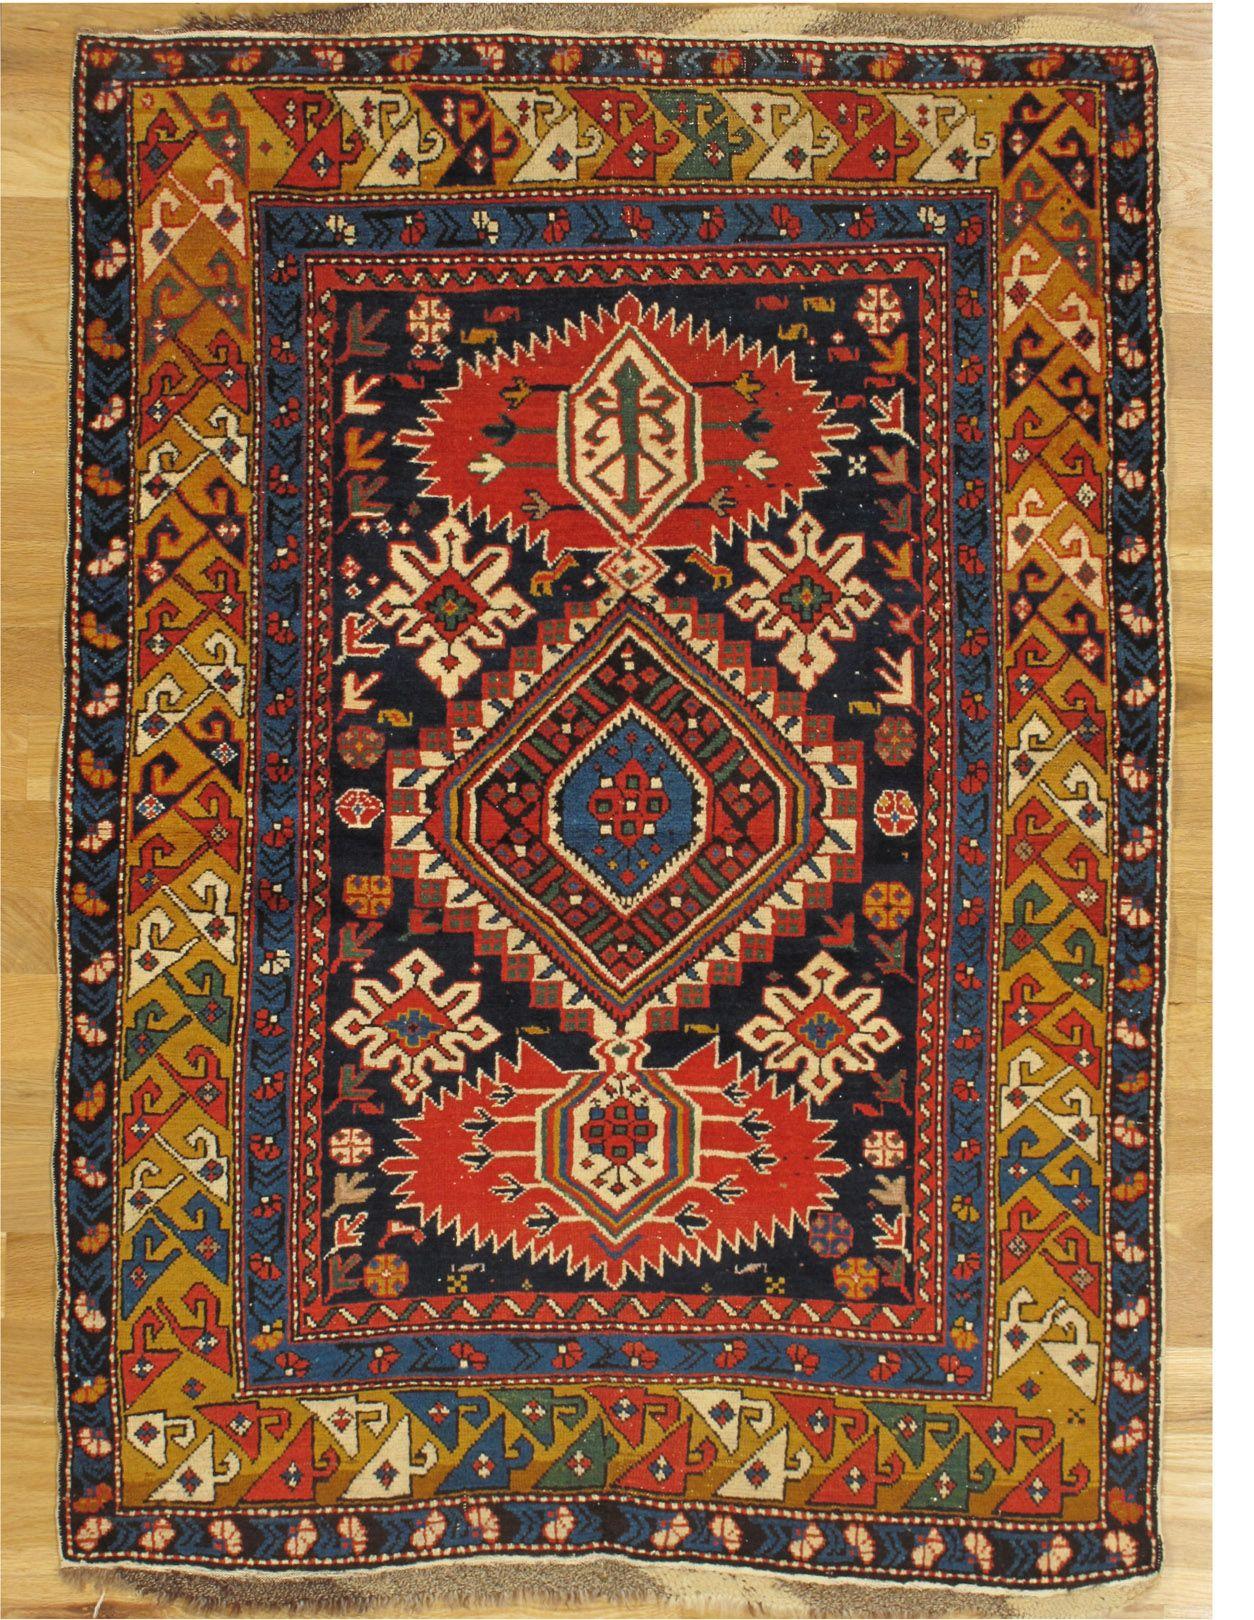 Karagashli Rug Kuba District Eastern Caucasus West Coast Of The Caspian Sea Circa 1870 Dimensions 5 0 X3 6 152x107 Cm Rugs On Carpet Rugs Antique Rugs